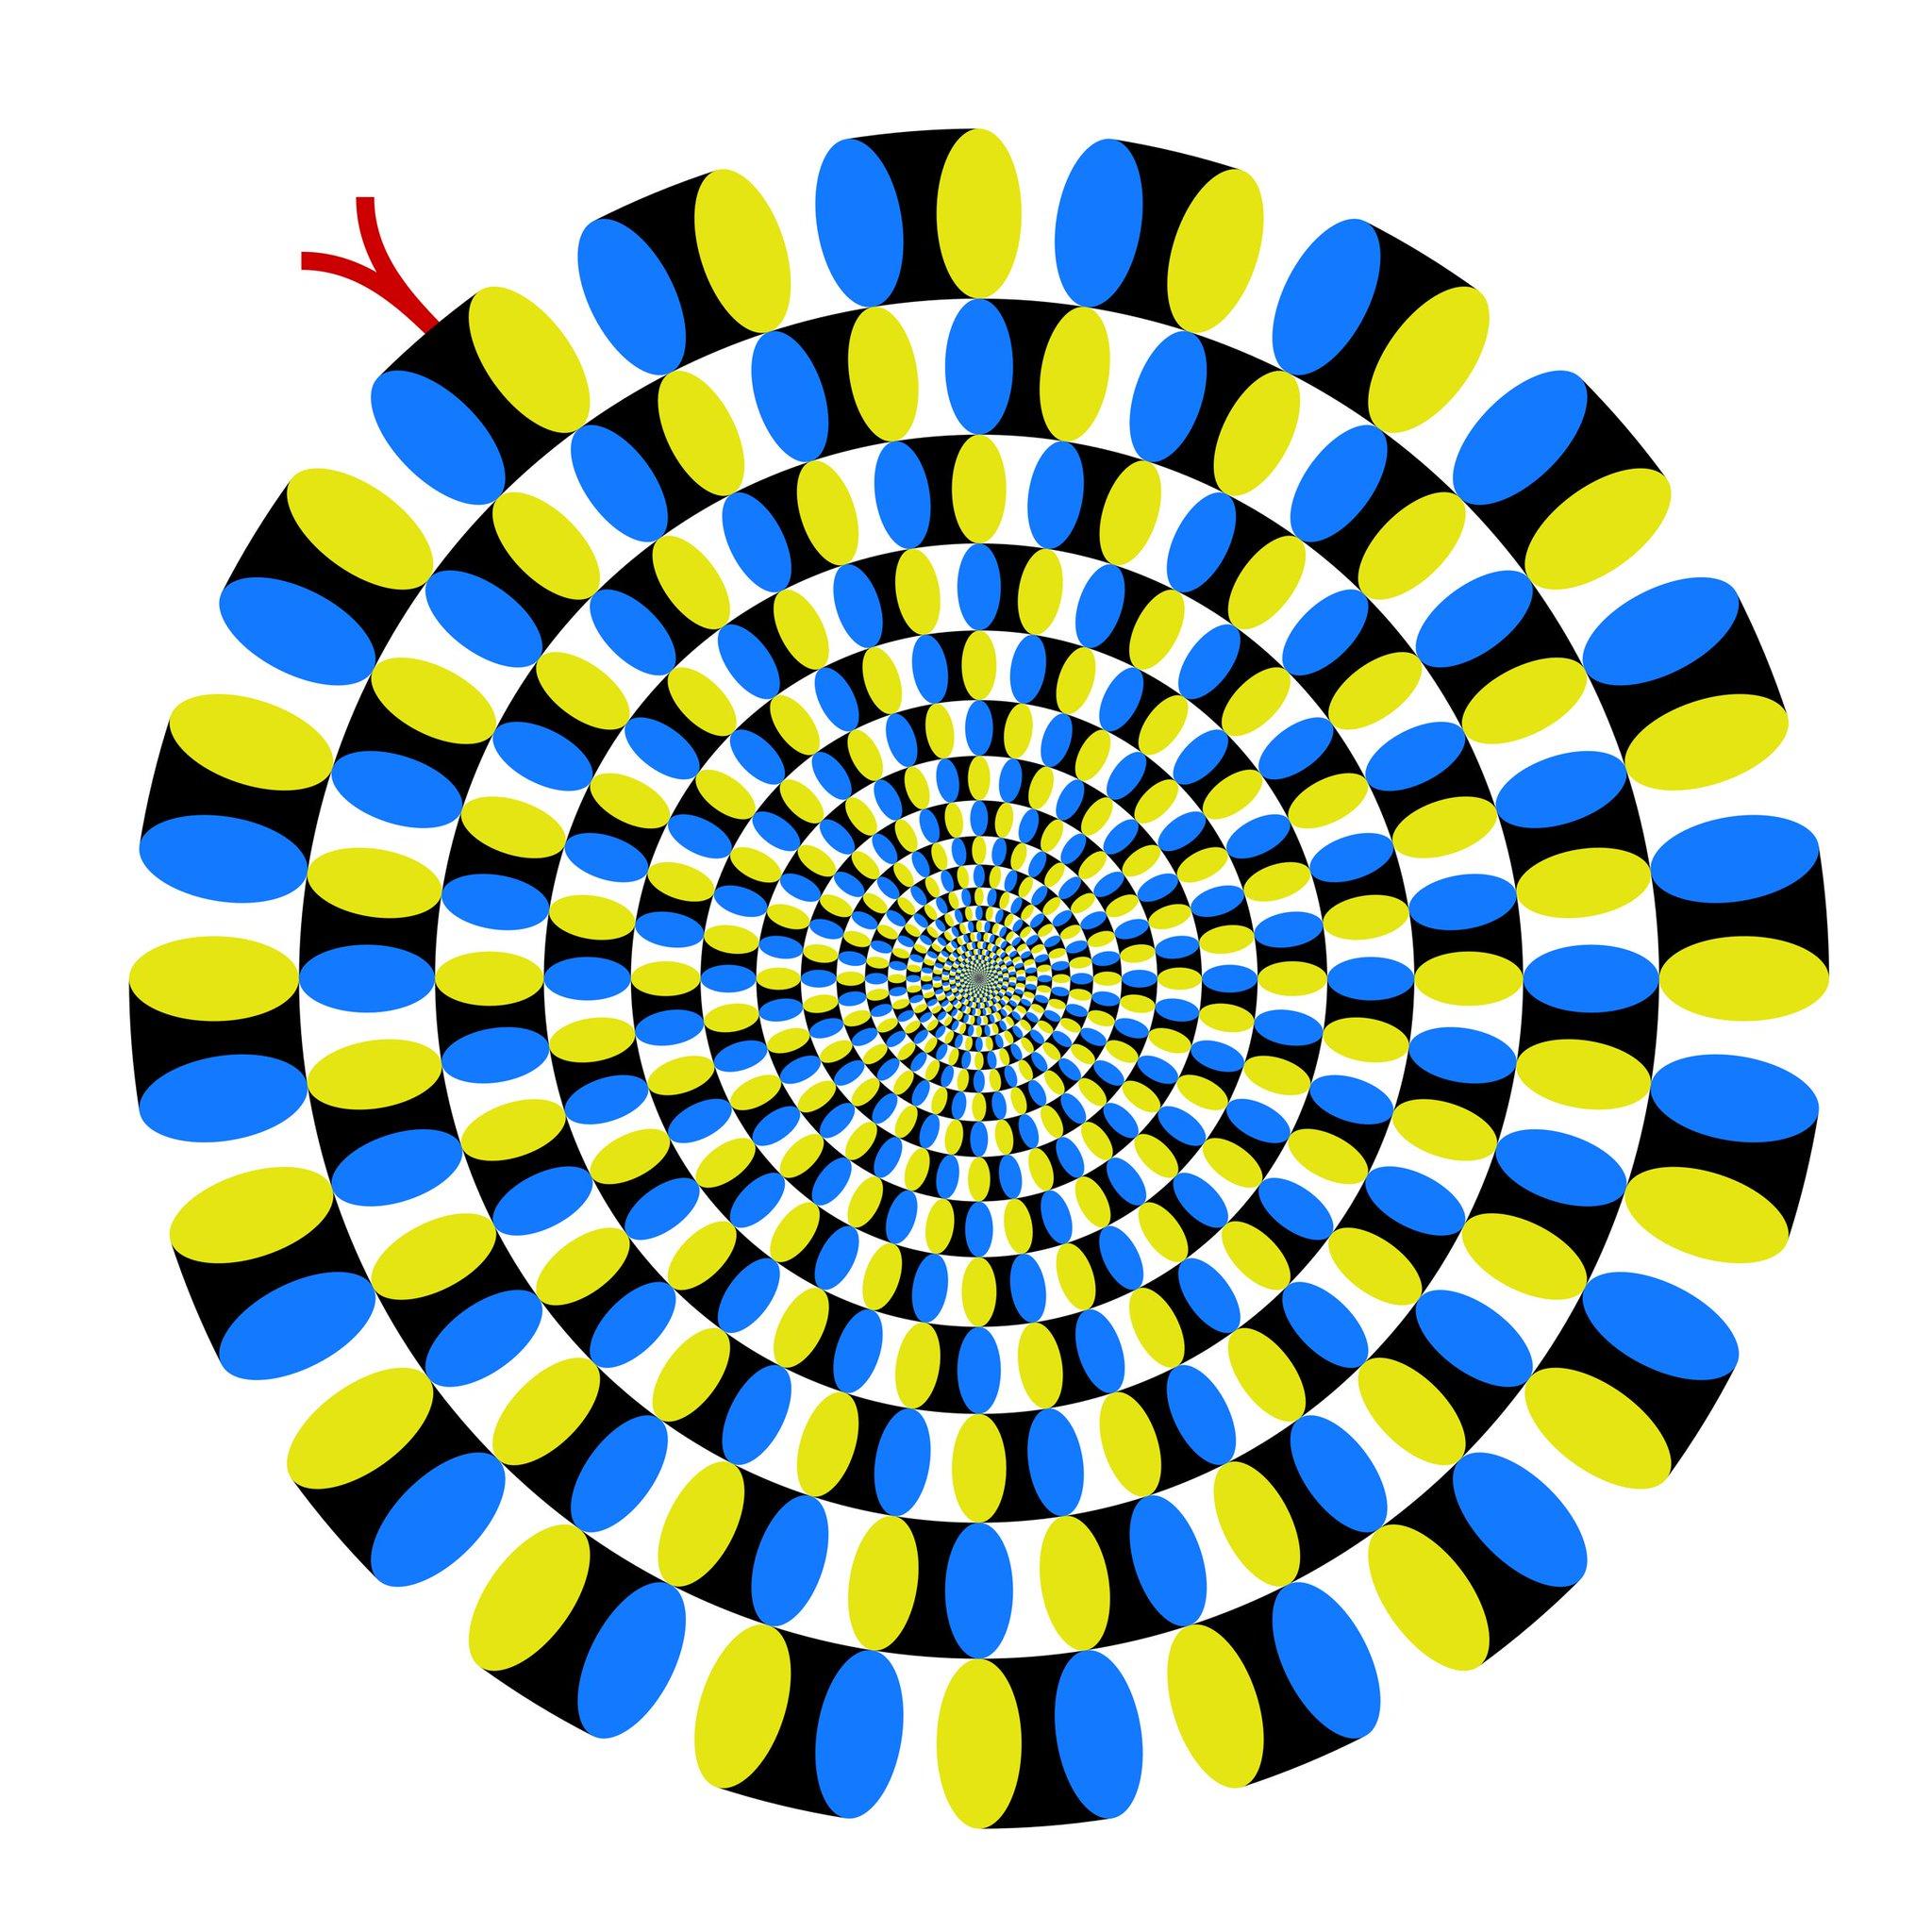 образом, картинка иллюзия змеи признаётся сама звезда